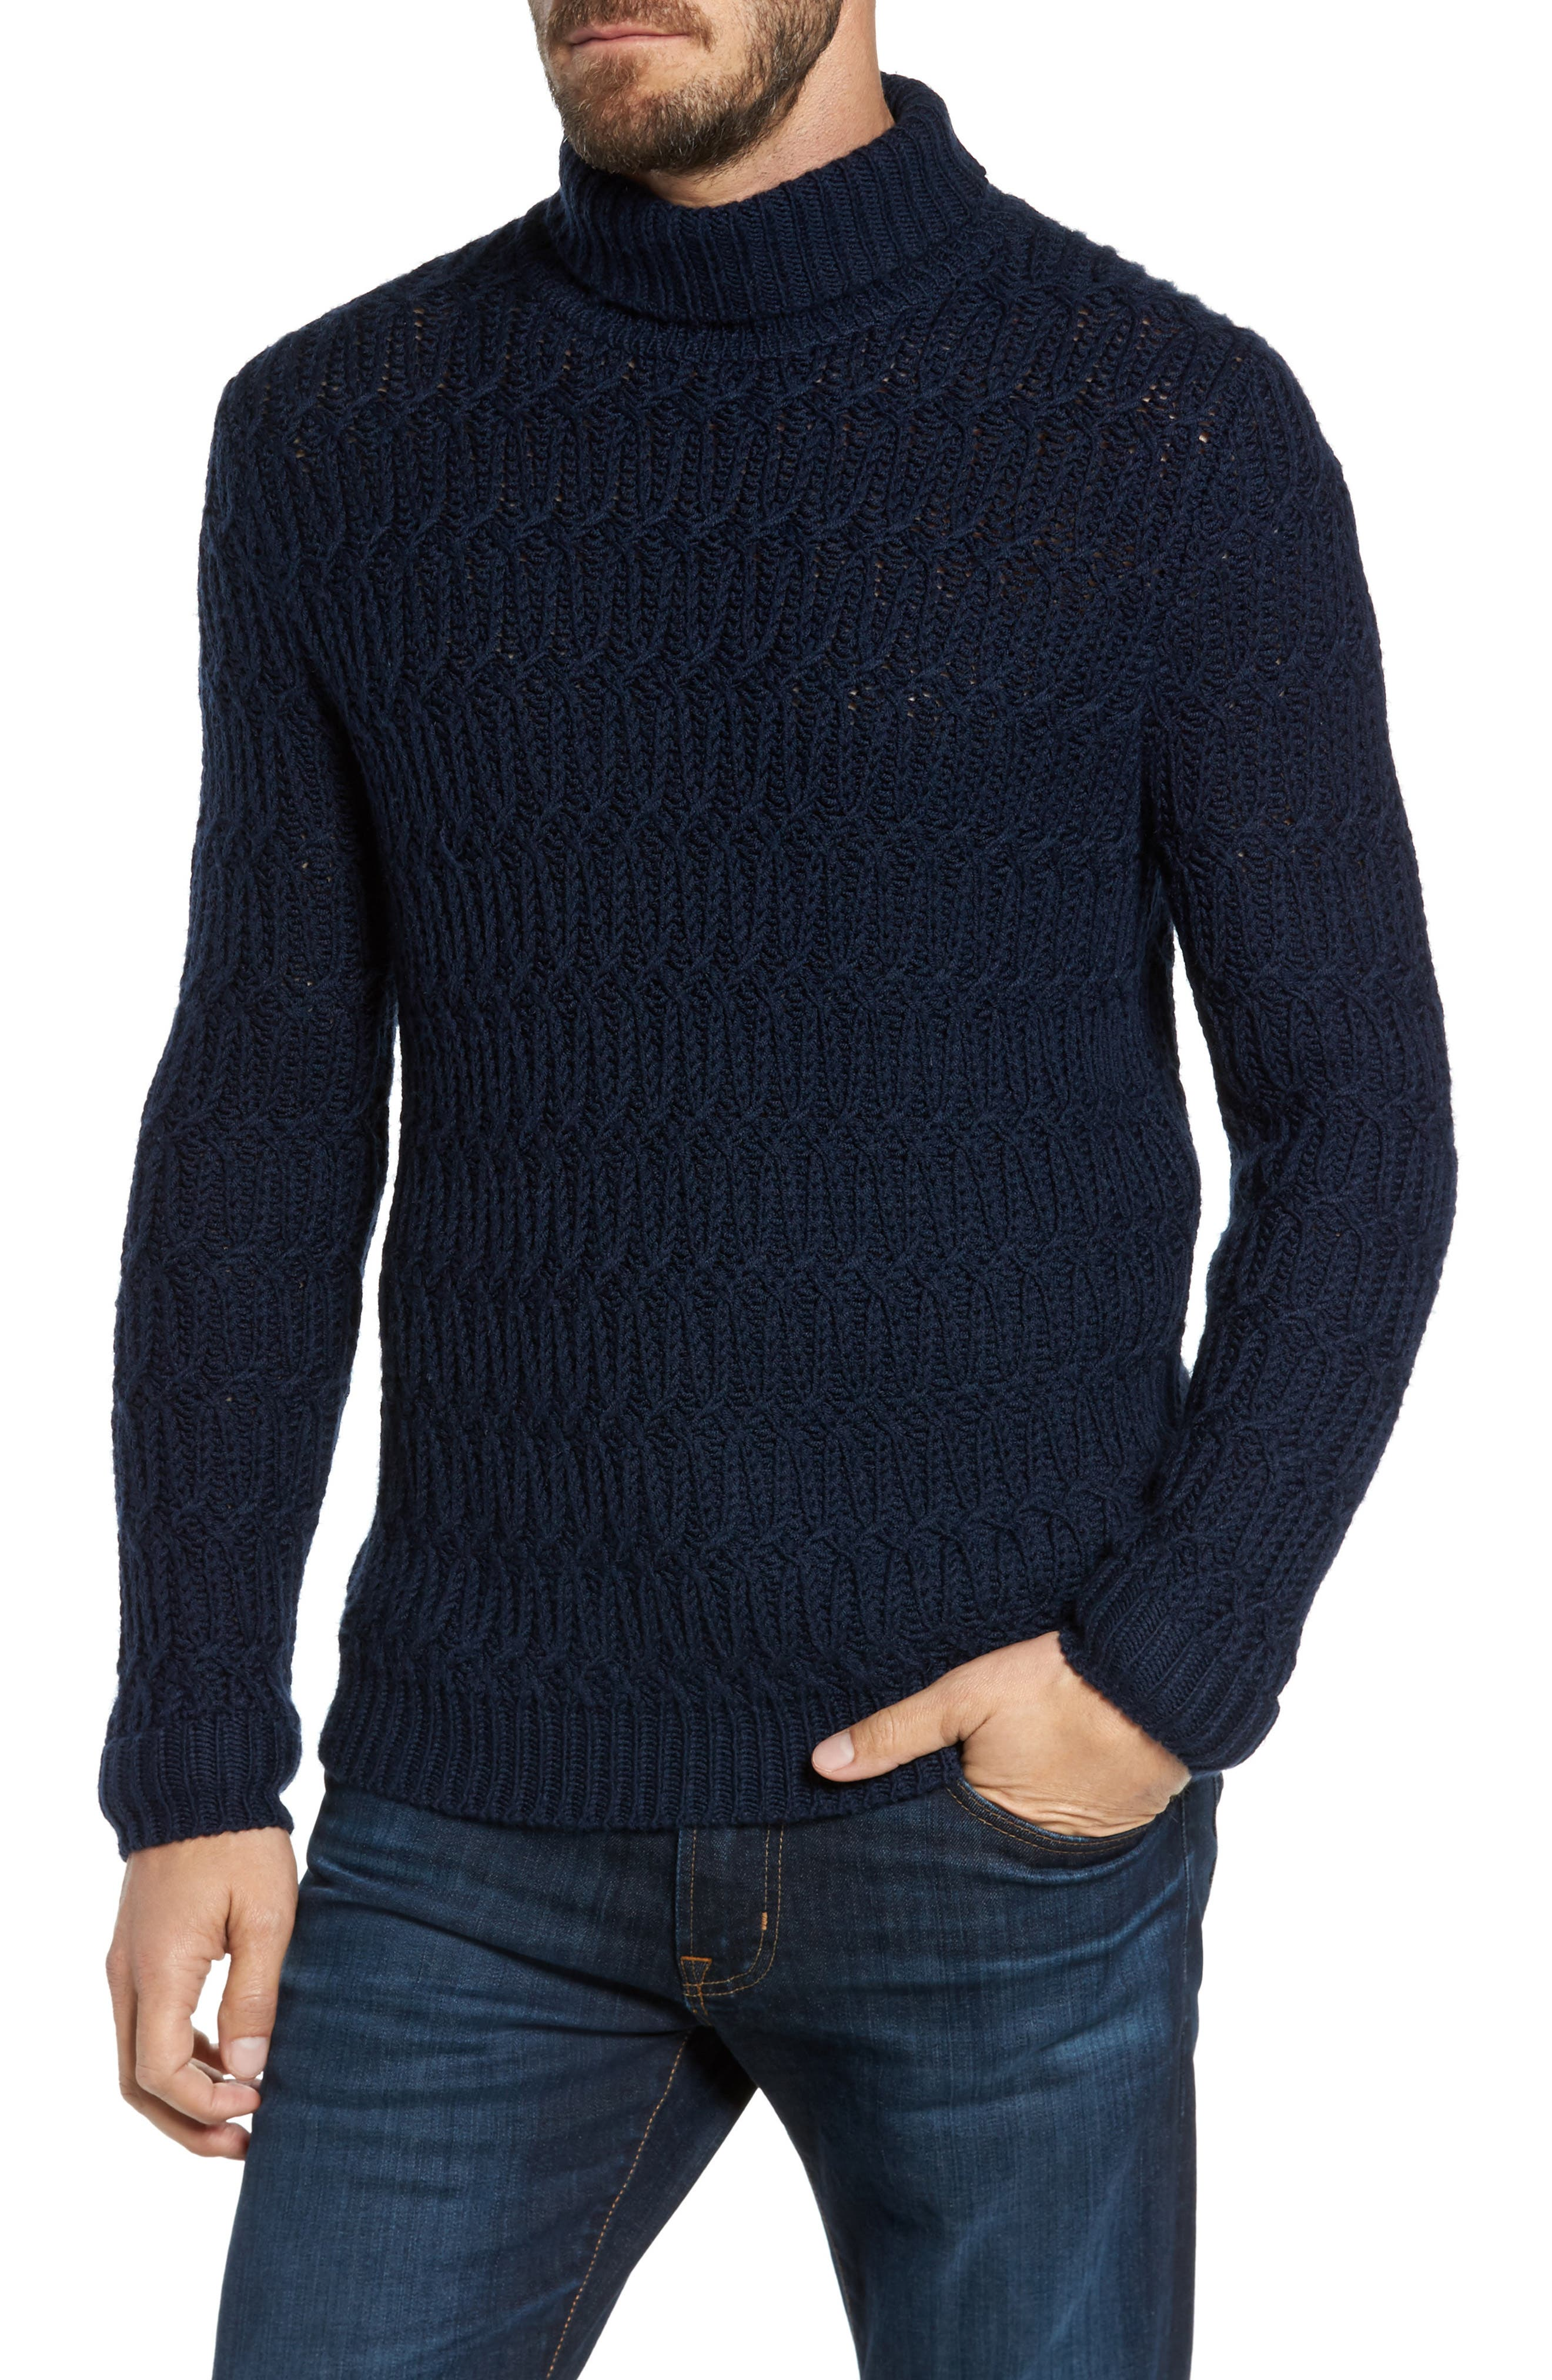 Chunky Turtleneck Sweater,                             Main thumbnail 1, color,